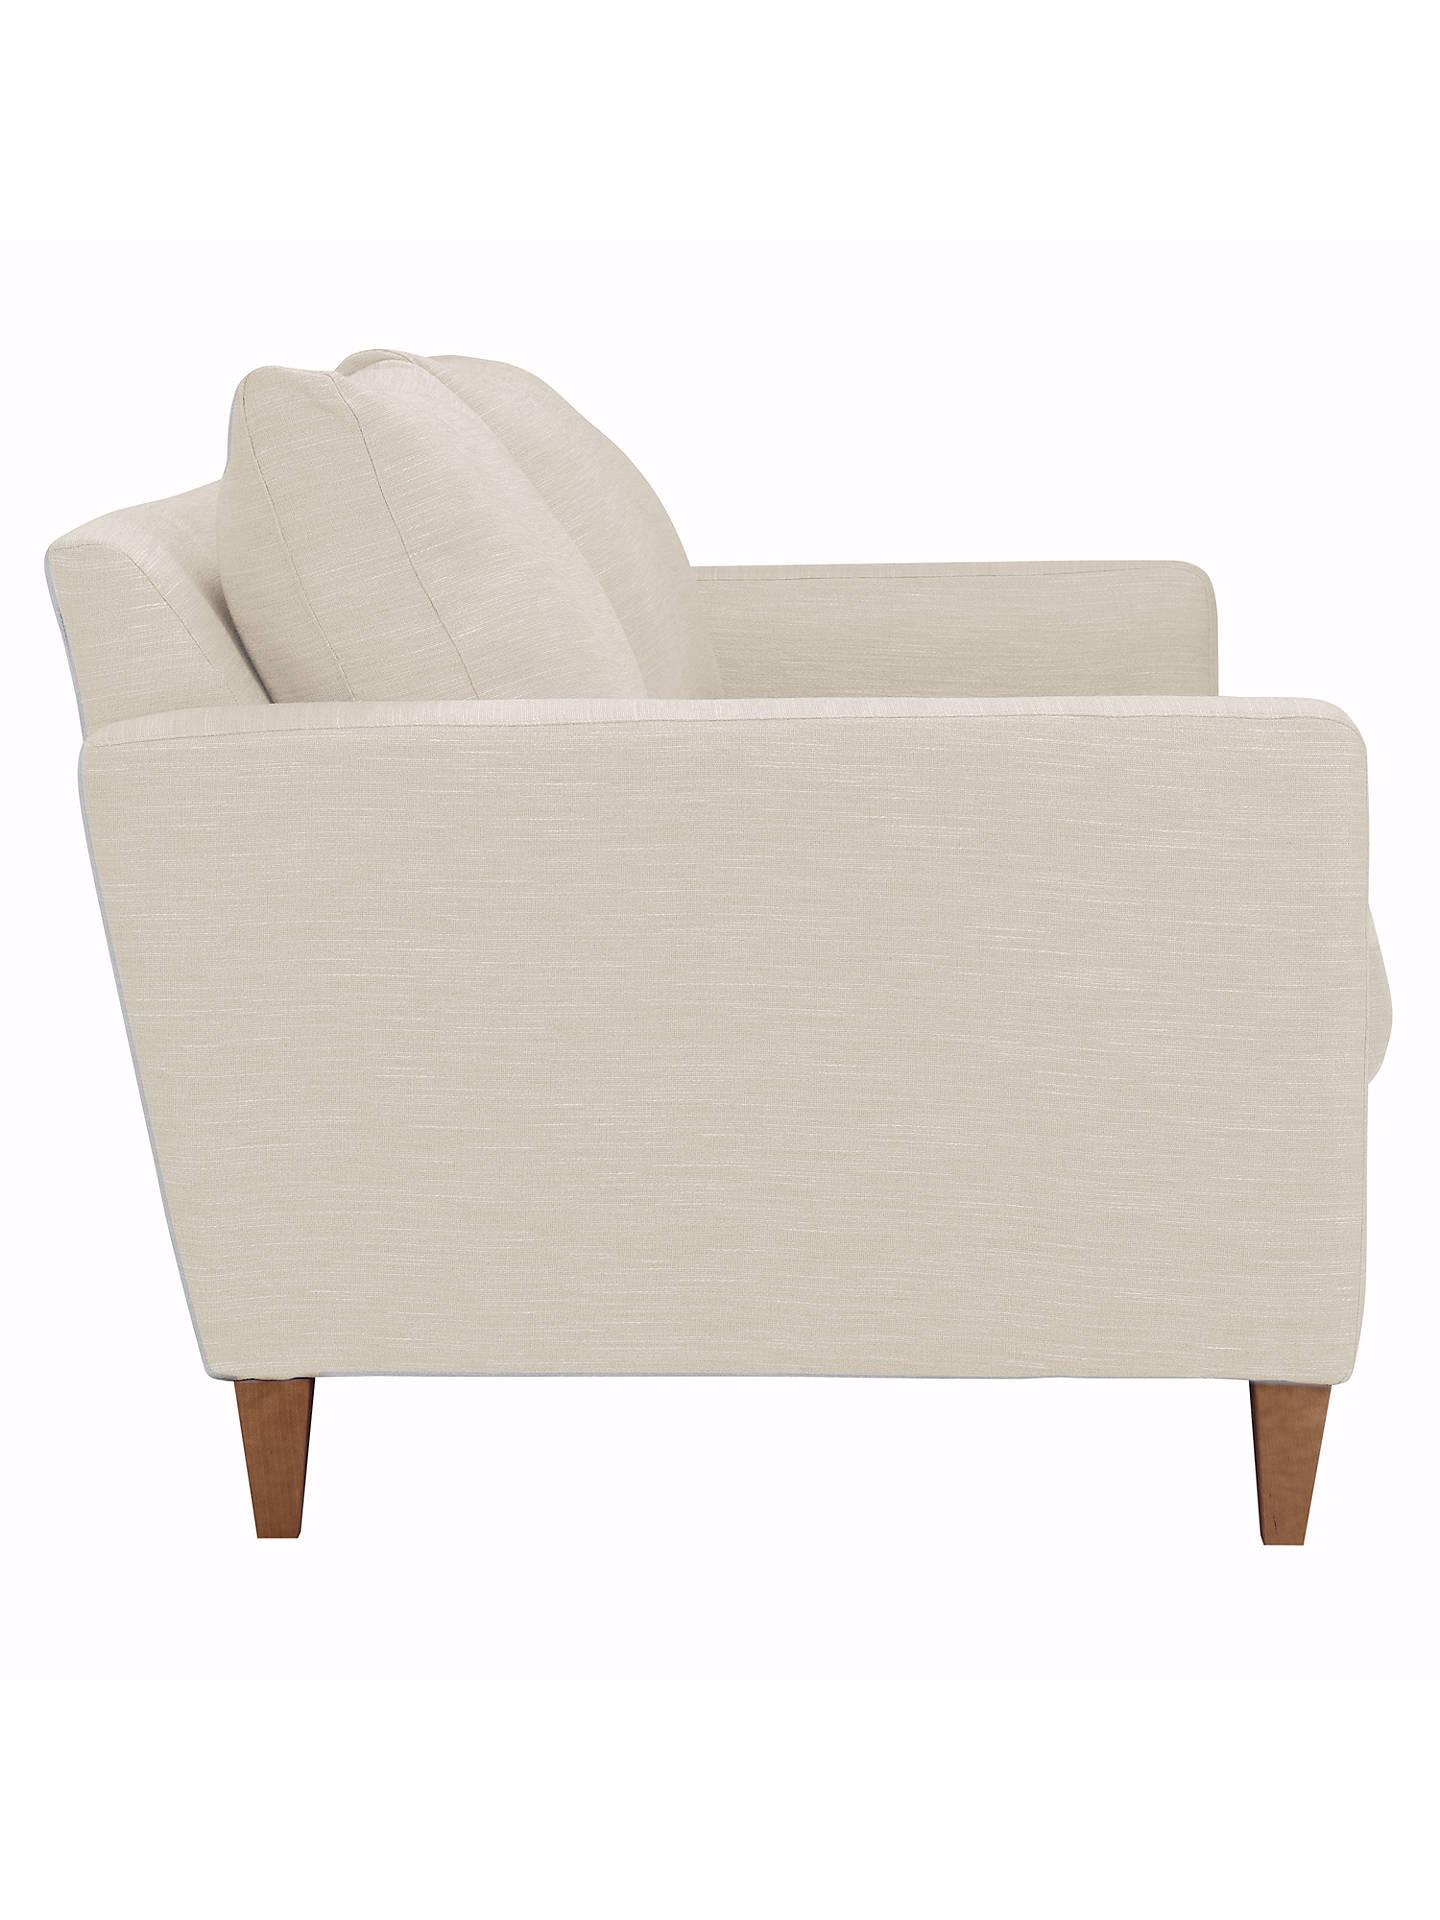 John Lewis Bailey Loose Cover Medium 2 Seater Sofa Light Leg